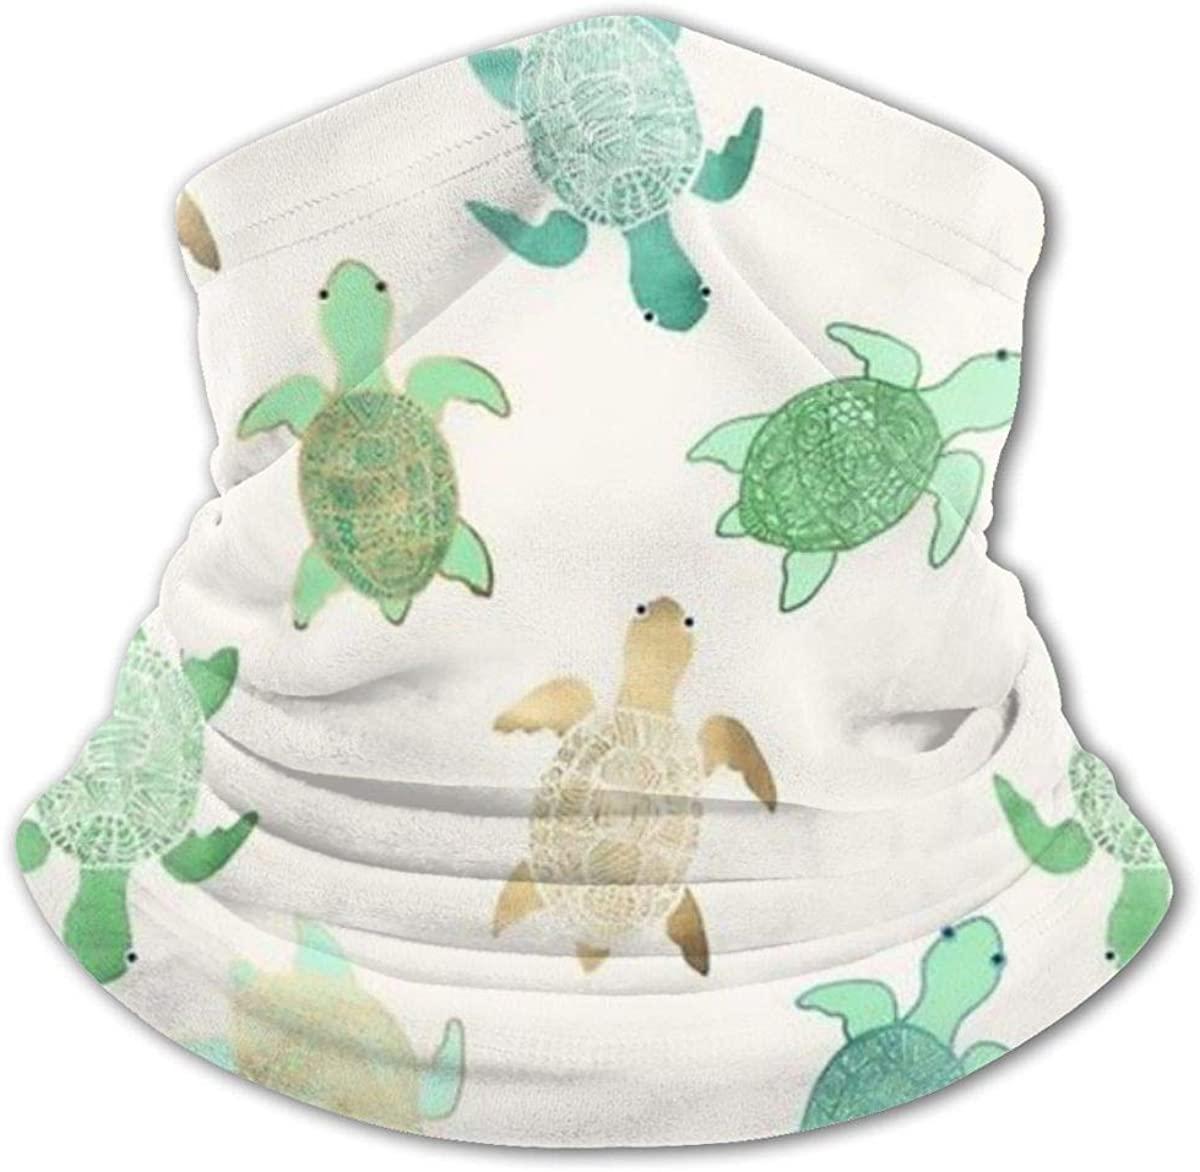 Sea Turtles Headwear For Girls And Boys, Head Wrap, Neck Gaiter, Headband, Tenn Fishing Mask, Magic Scarf, Tube Mask, Face Bandana Mask For Camping Running Cycling